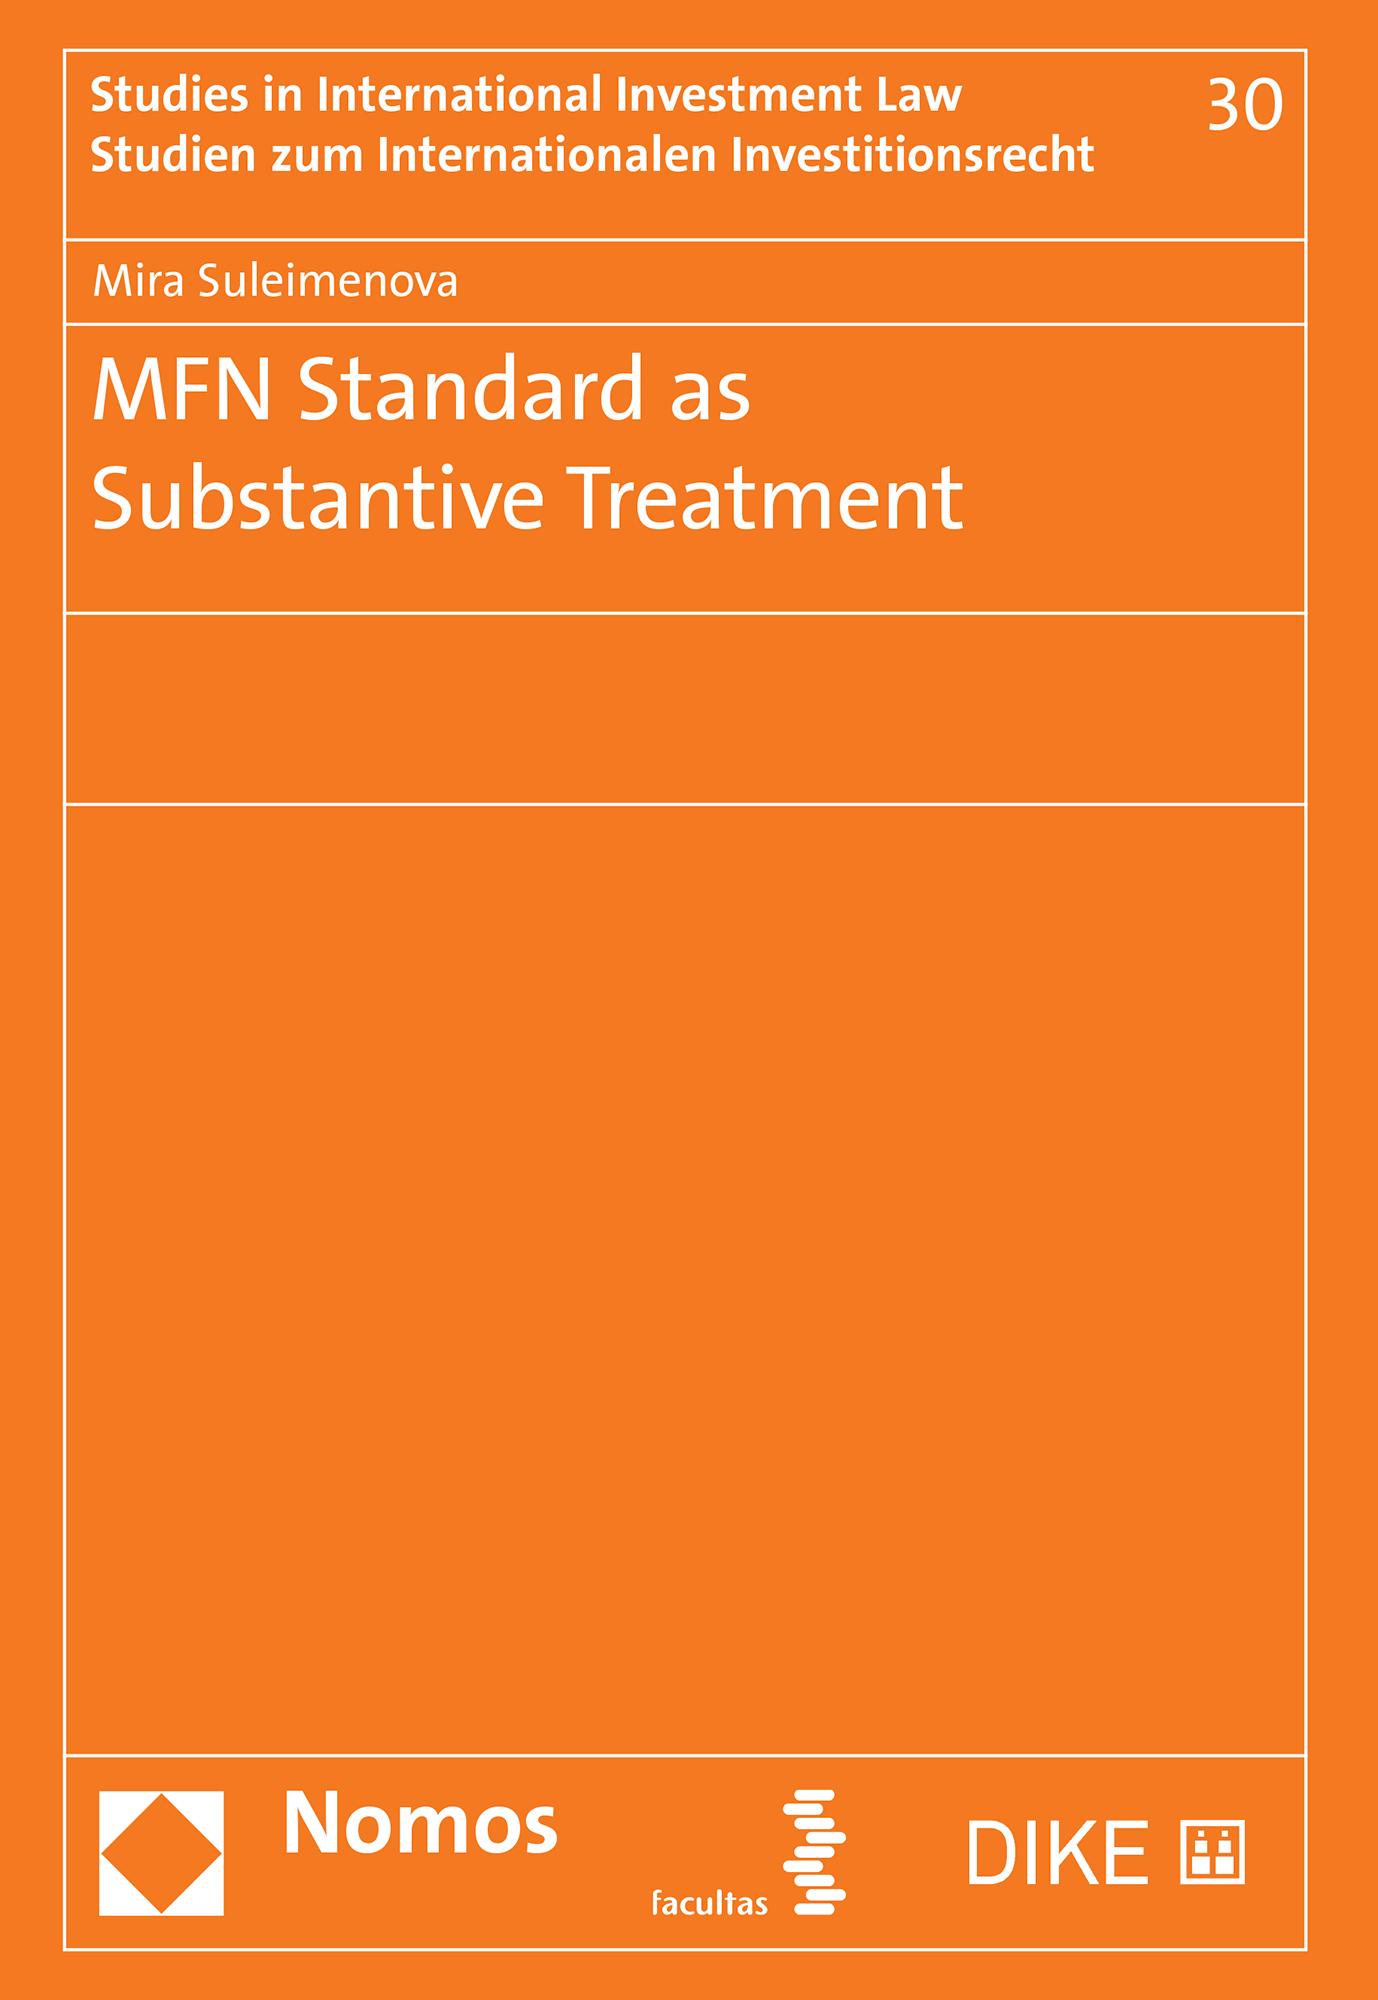 MFN Standard as Substantive Treatment